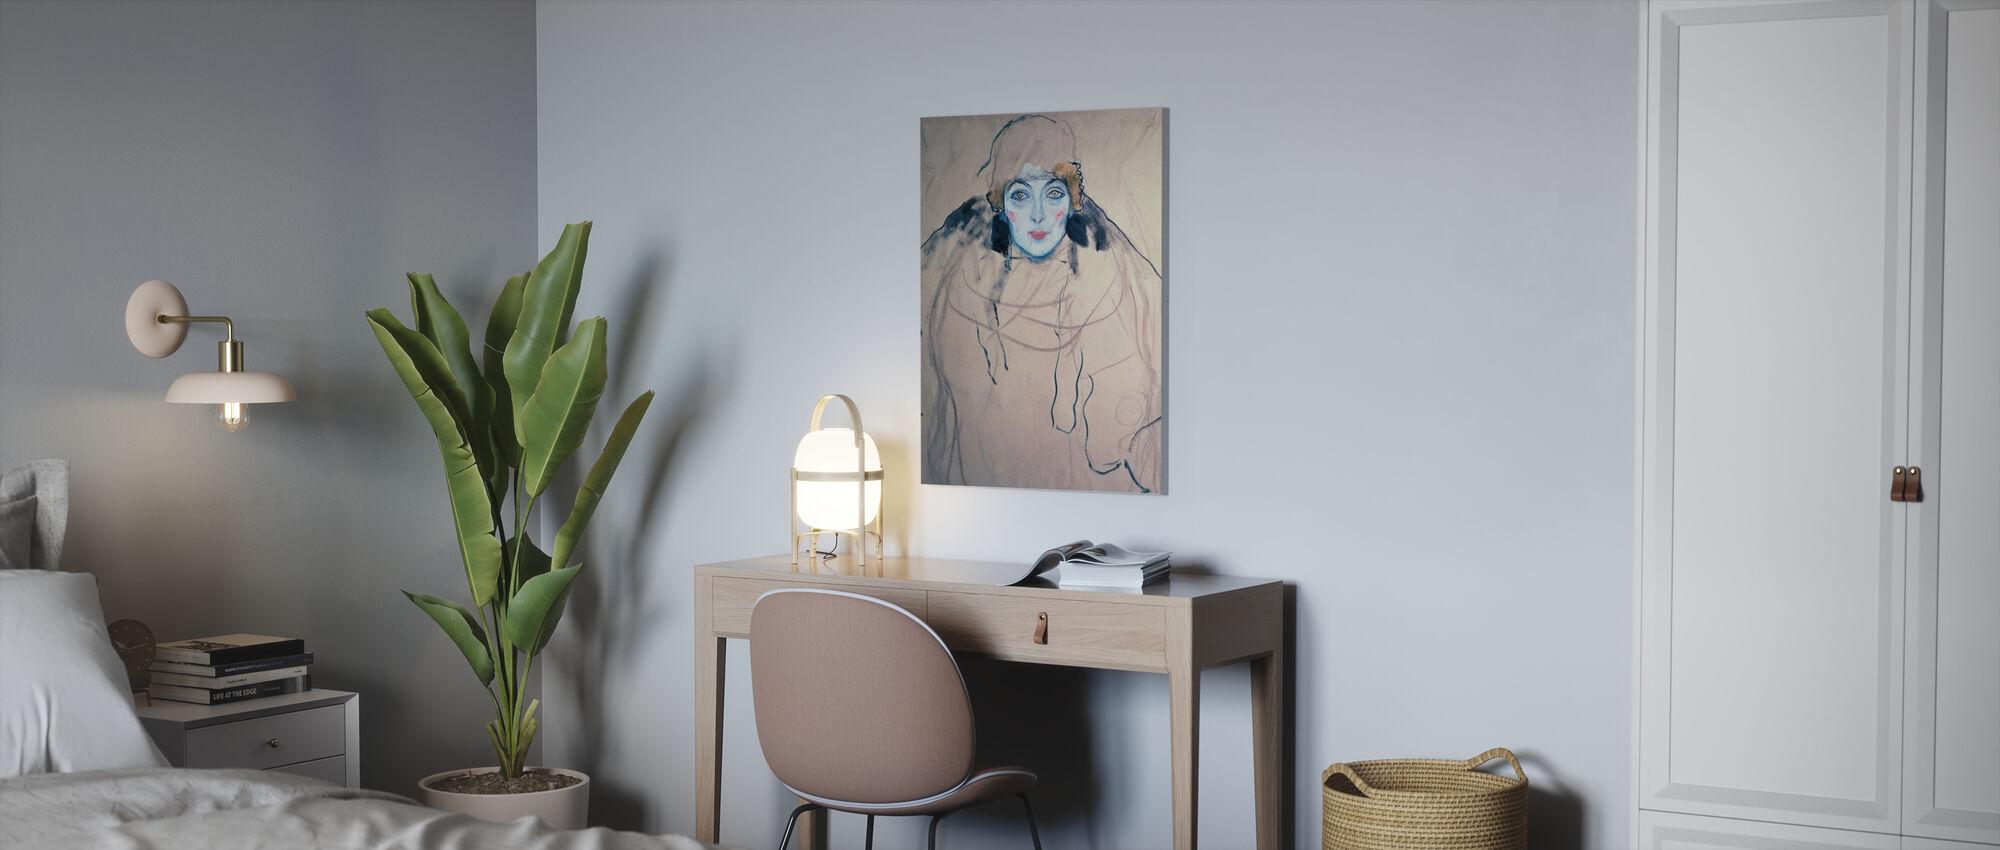 Head of a Woman, Gustav Klimt - Canvas print - Office